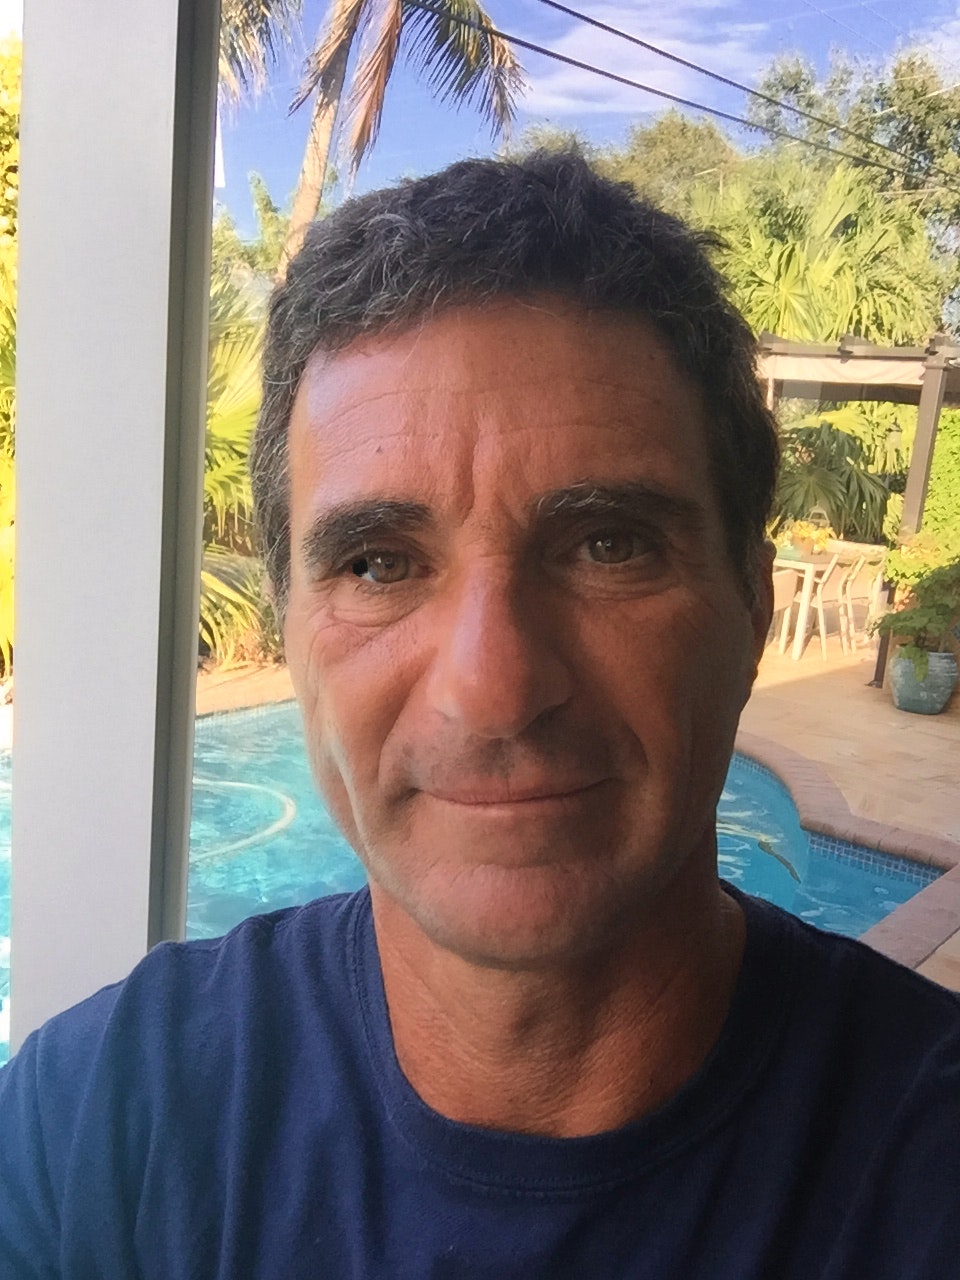 Giuseppe C. teaches tennis lessons in Fort Lauderdale, FLORIDA